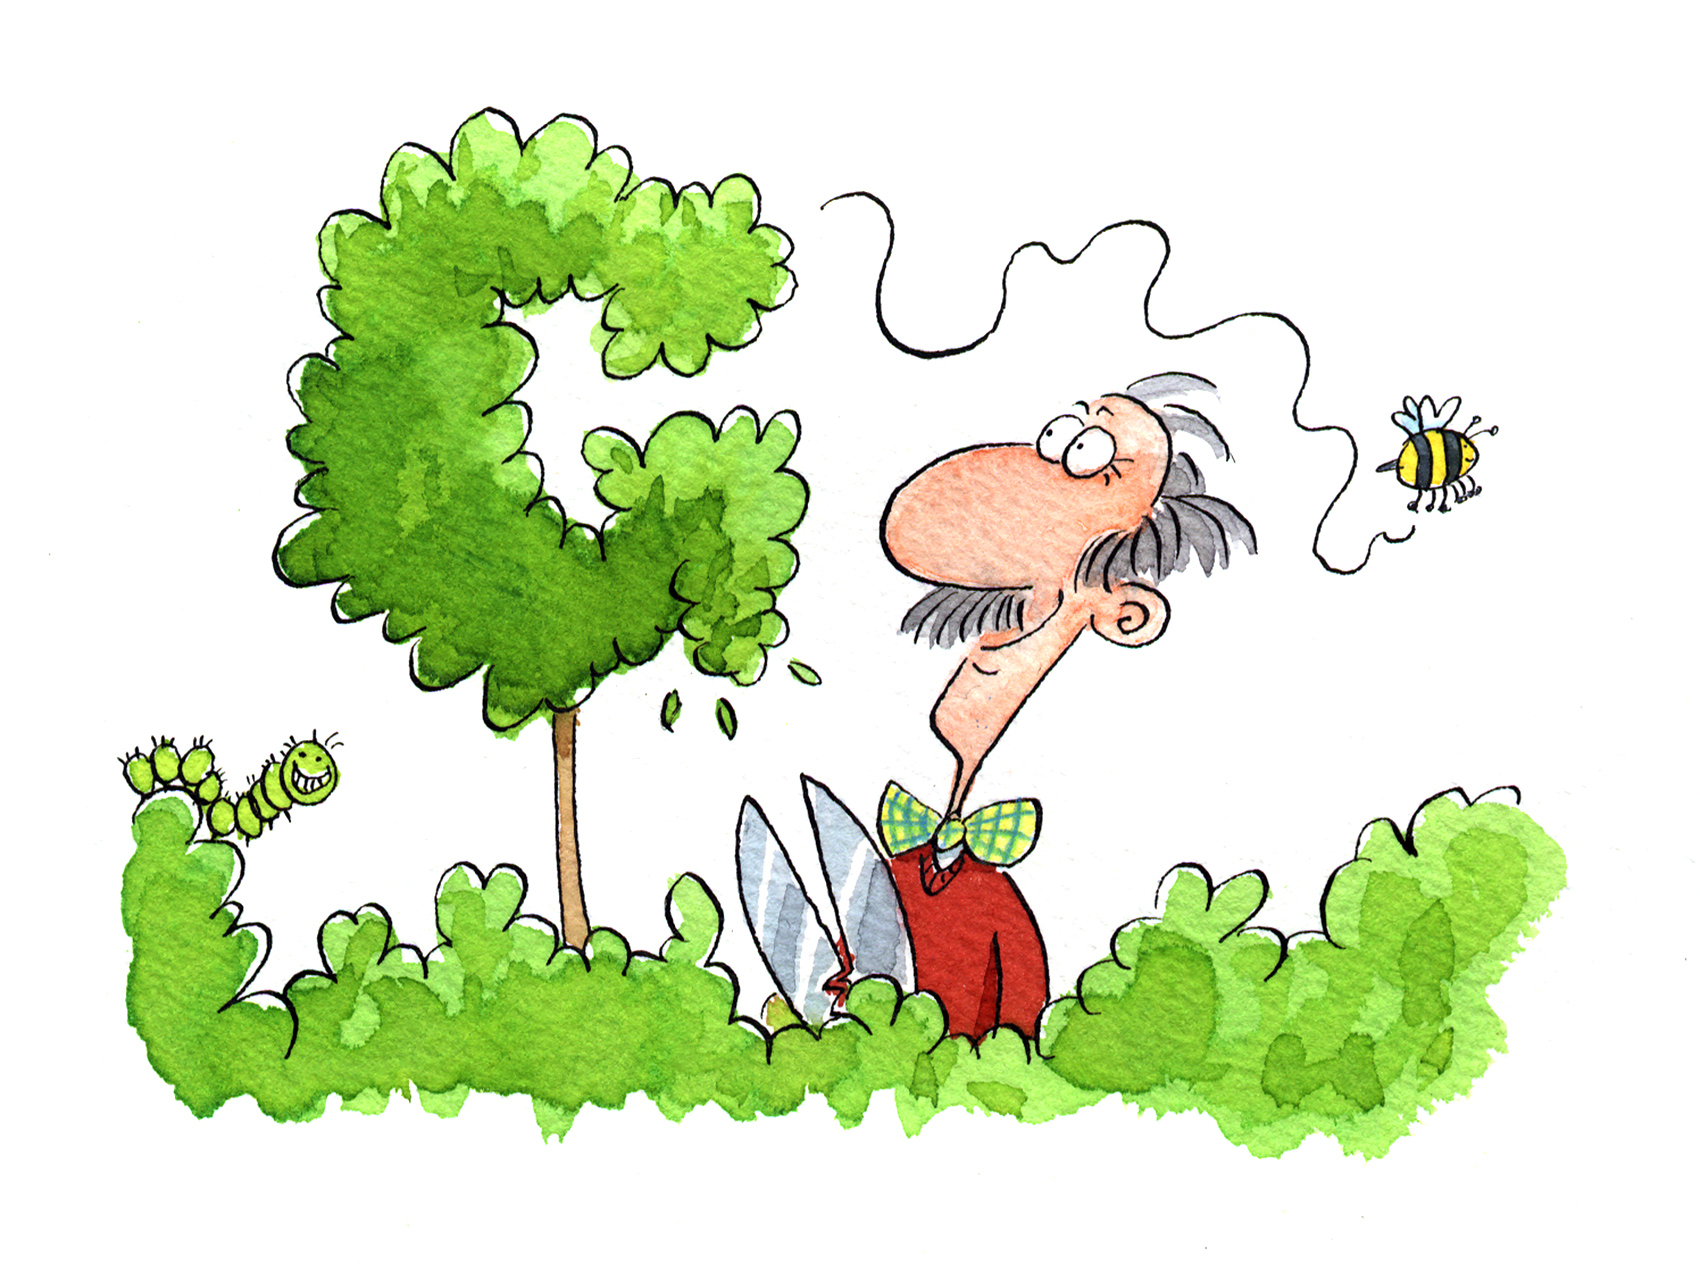 topiary, cartoon topiary, watercolour, gardener, man pruning hedge